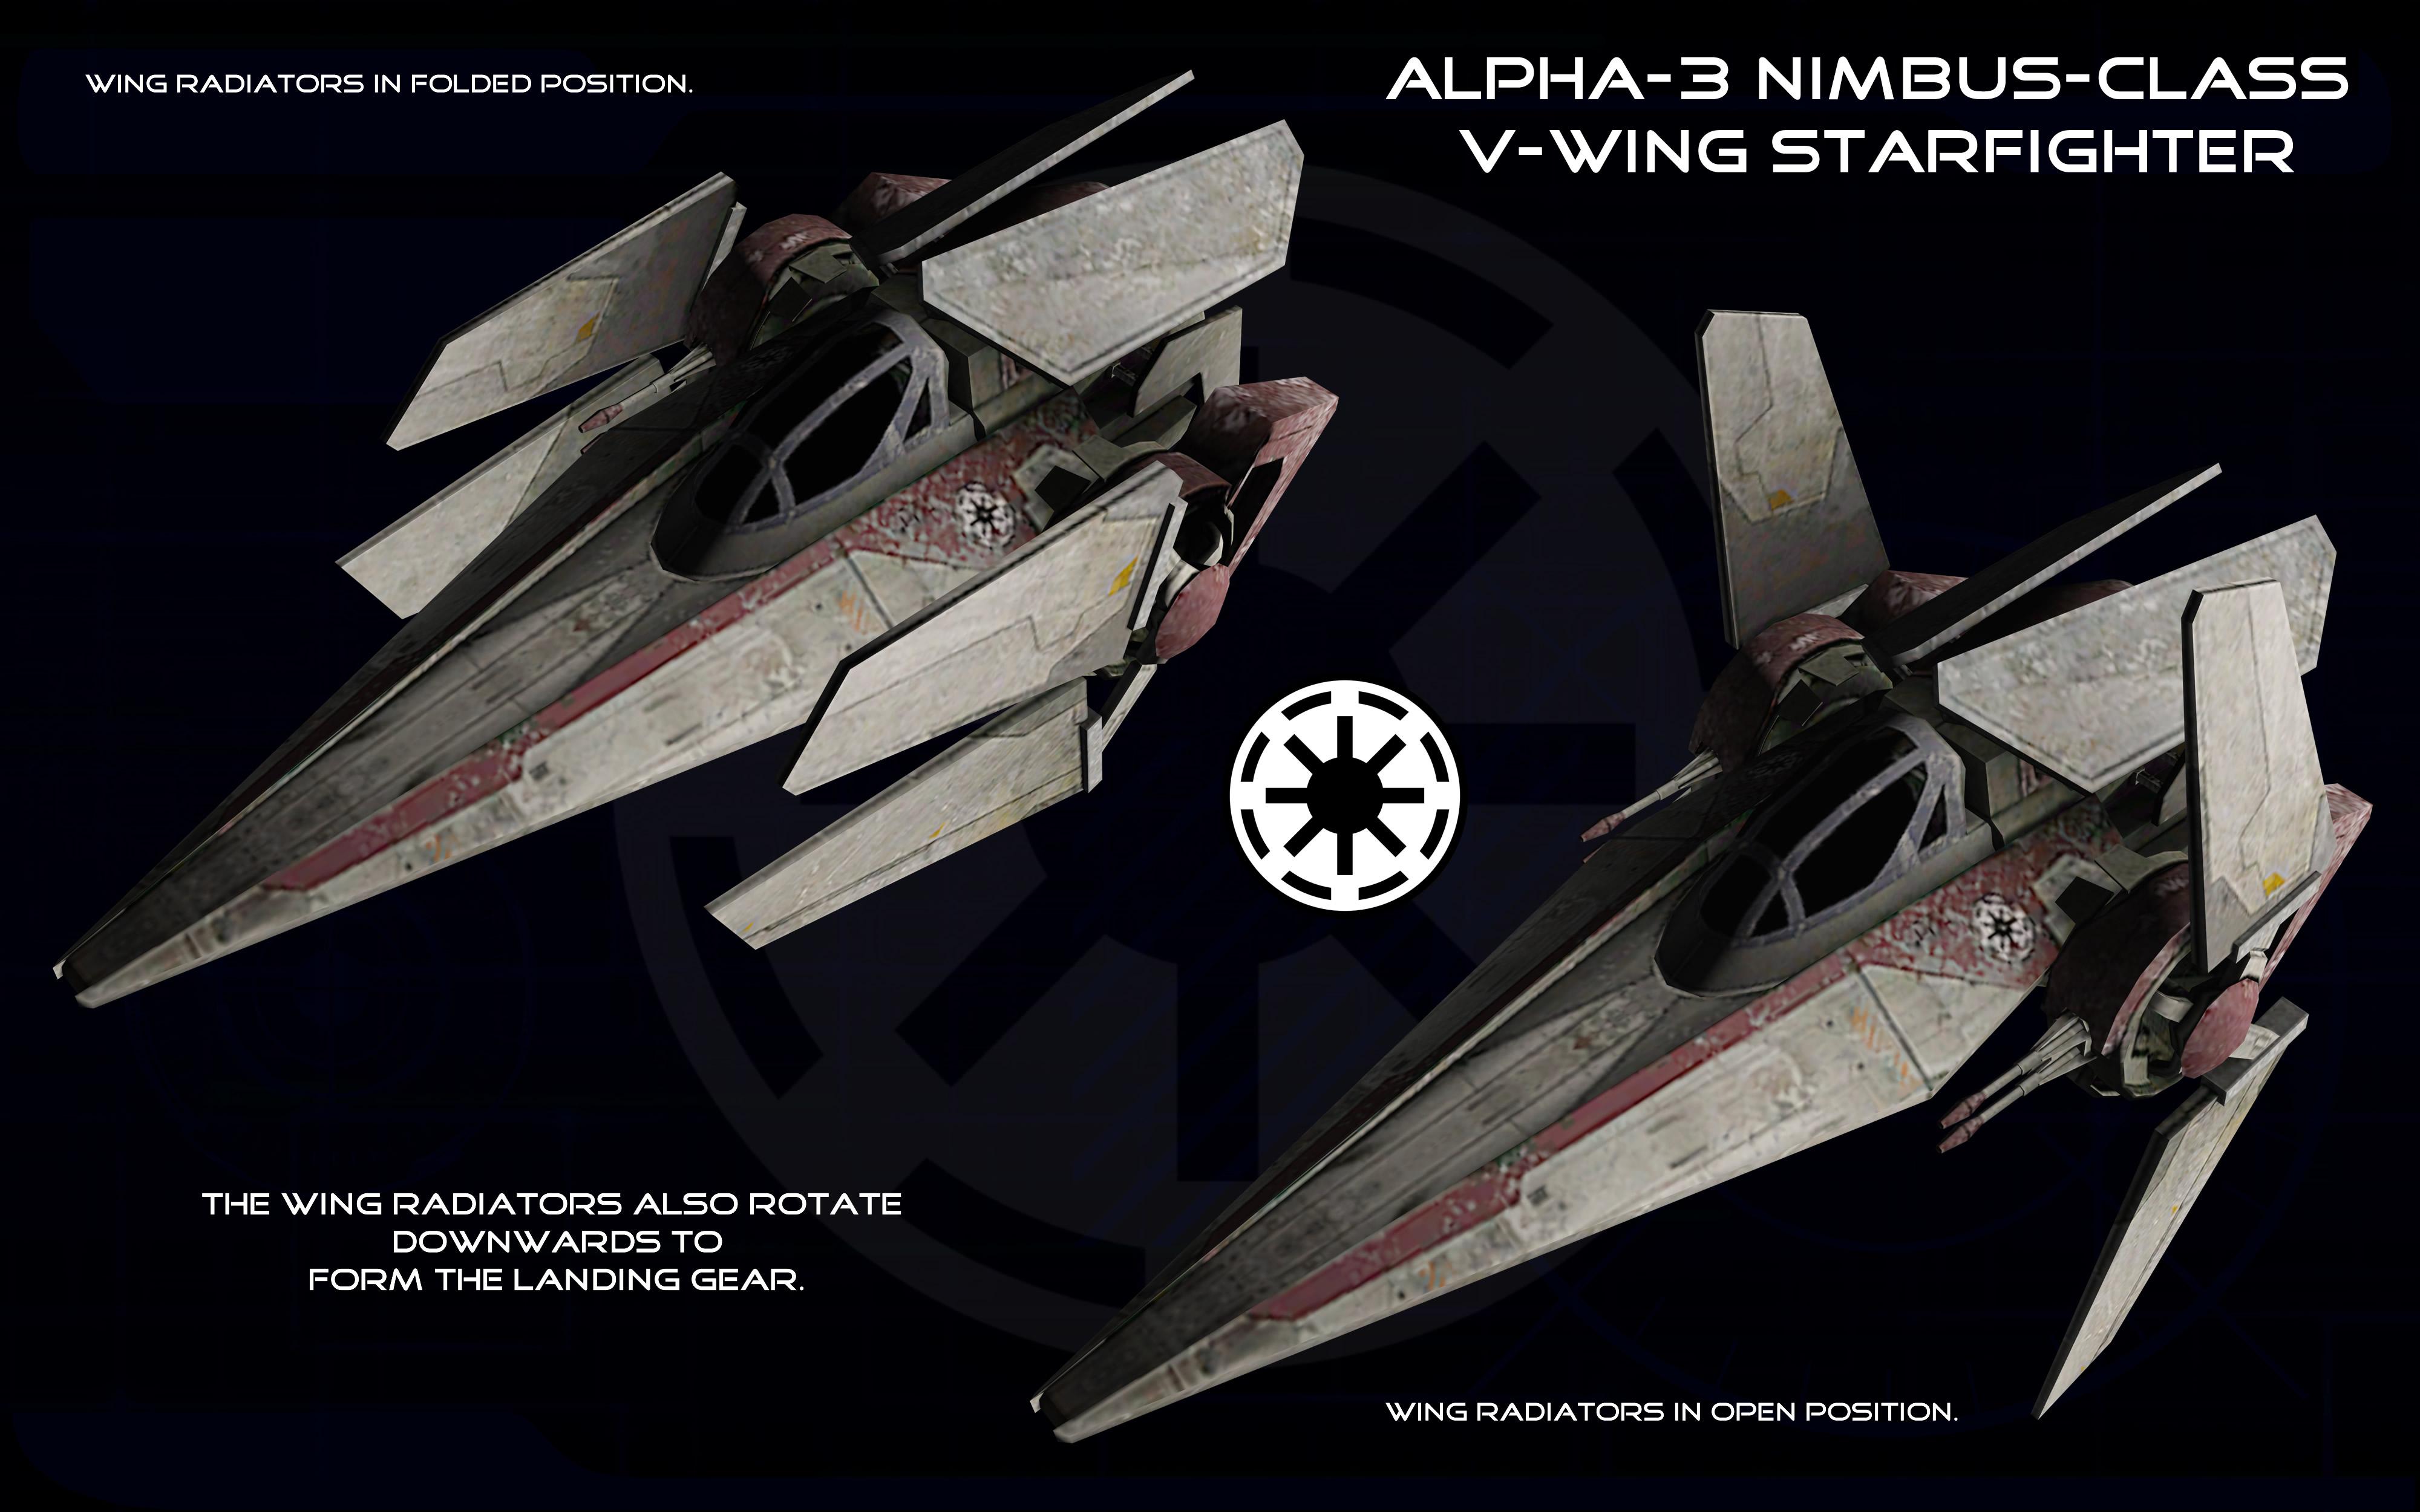 alpha 3 nimbus class v wing starfighter ortho 2 by unusualsuspex on deviantart. Black Bedroom Furniture Sets. Home Design Ideas